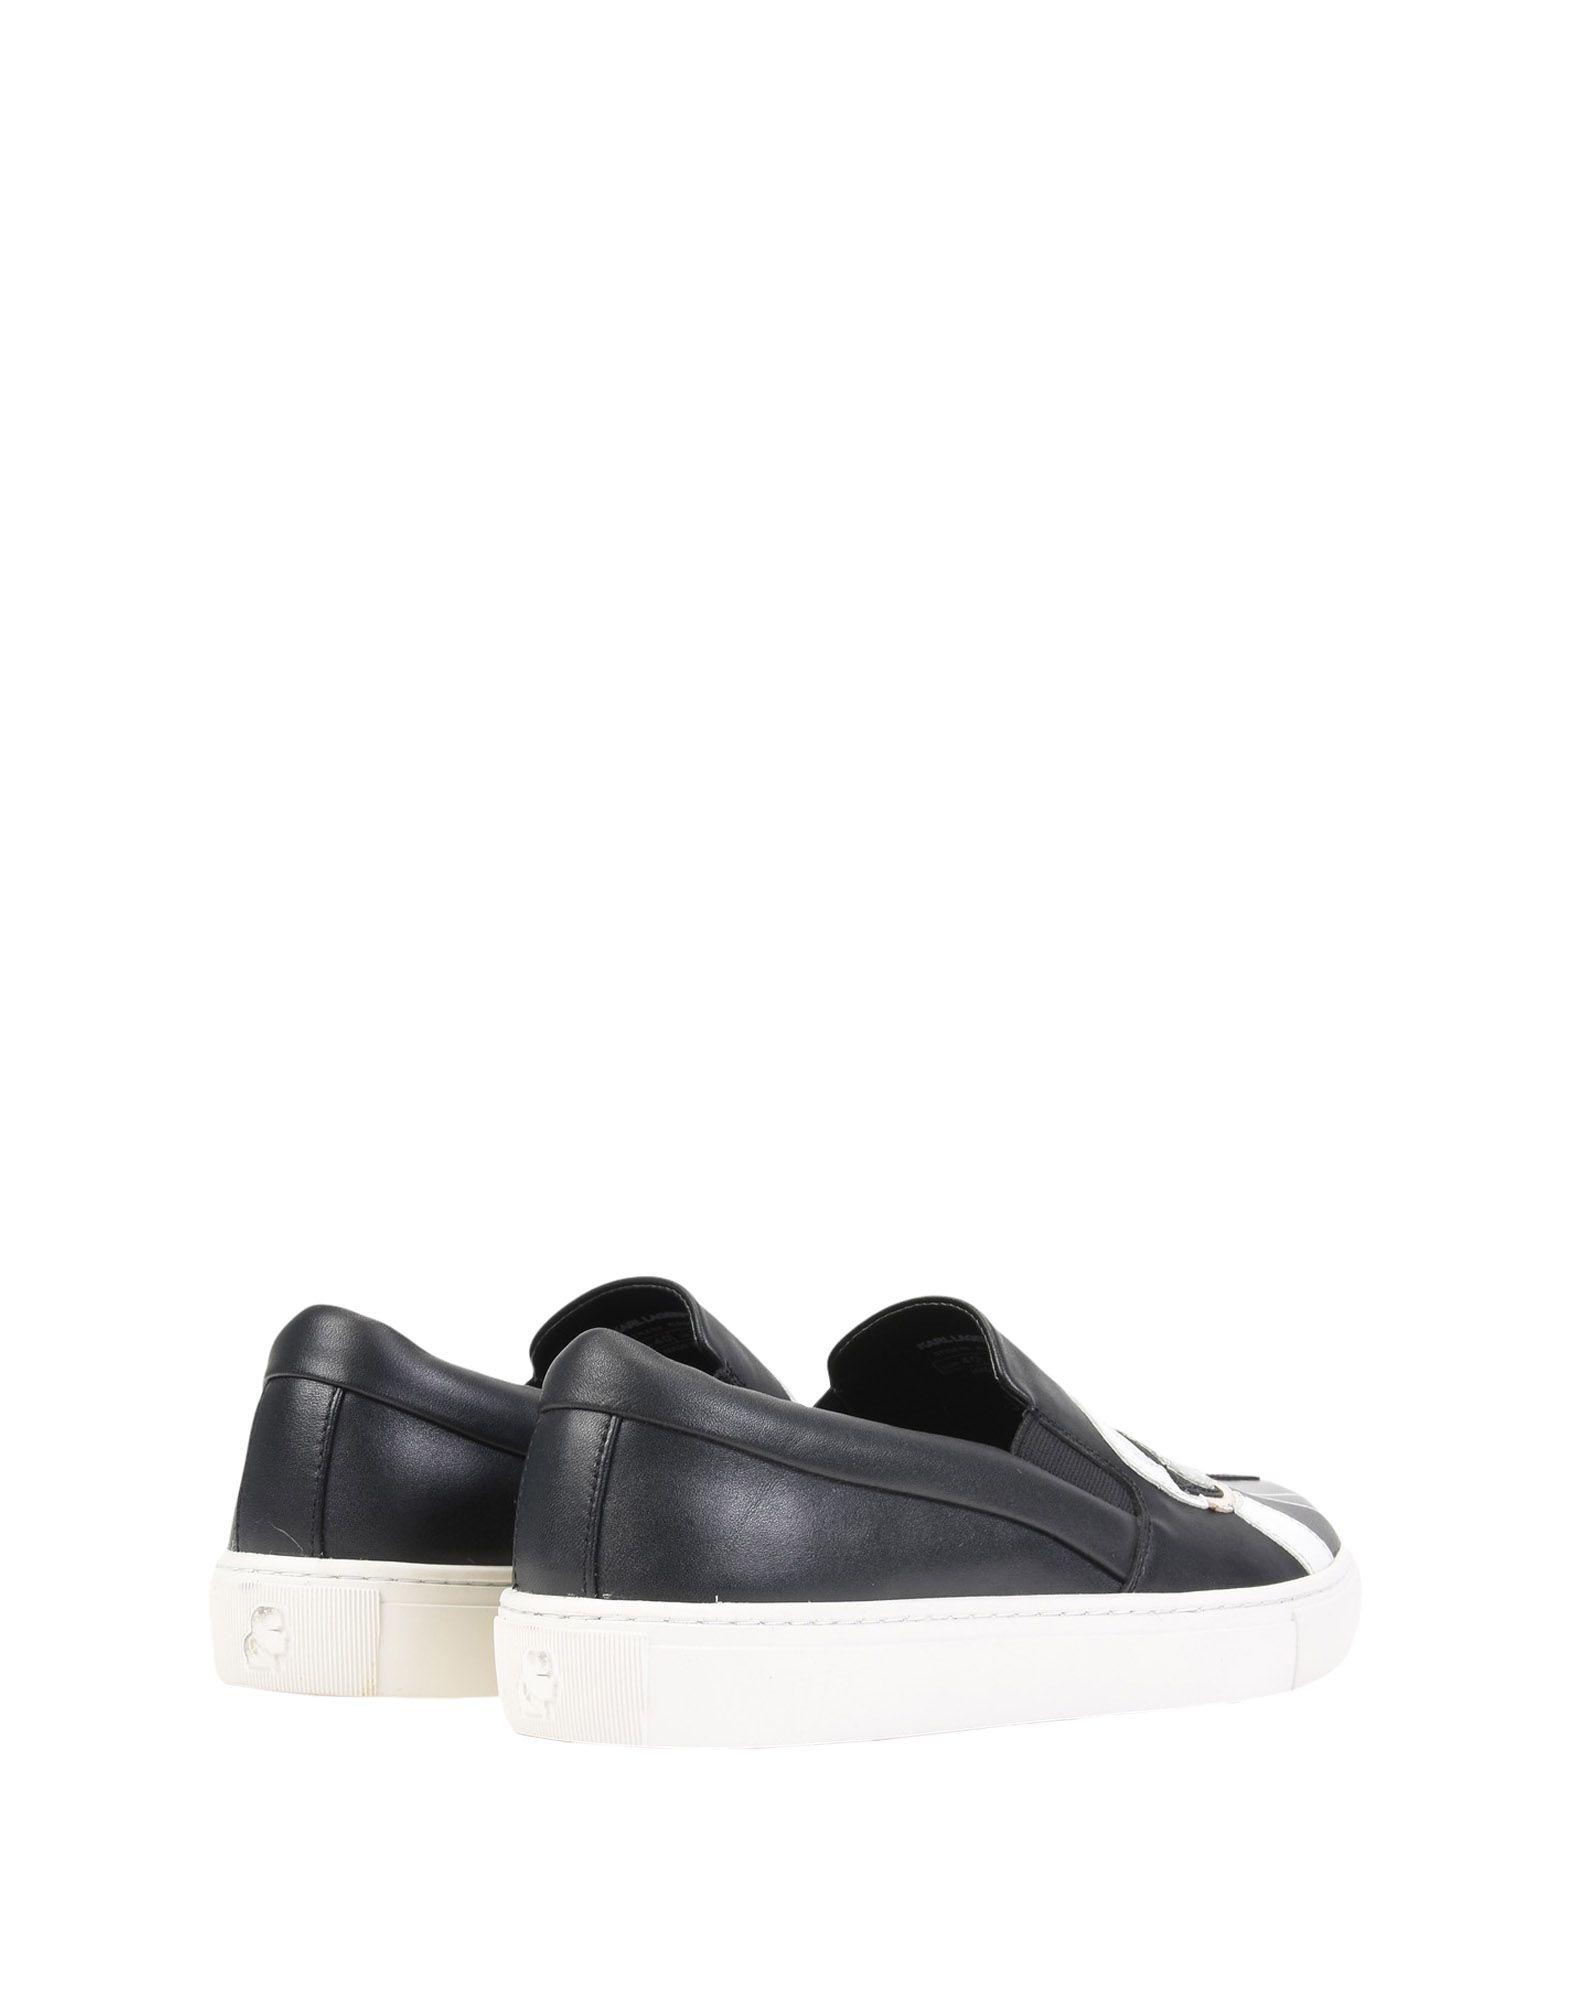 Karl Lagerfeld 11497409QIGut Sneakers Damen  11497409QIGut Lagerfeld aussehende strapazierfähige Schuhe 27d32f